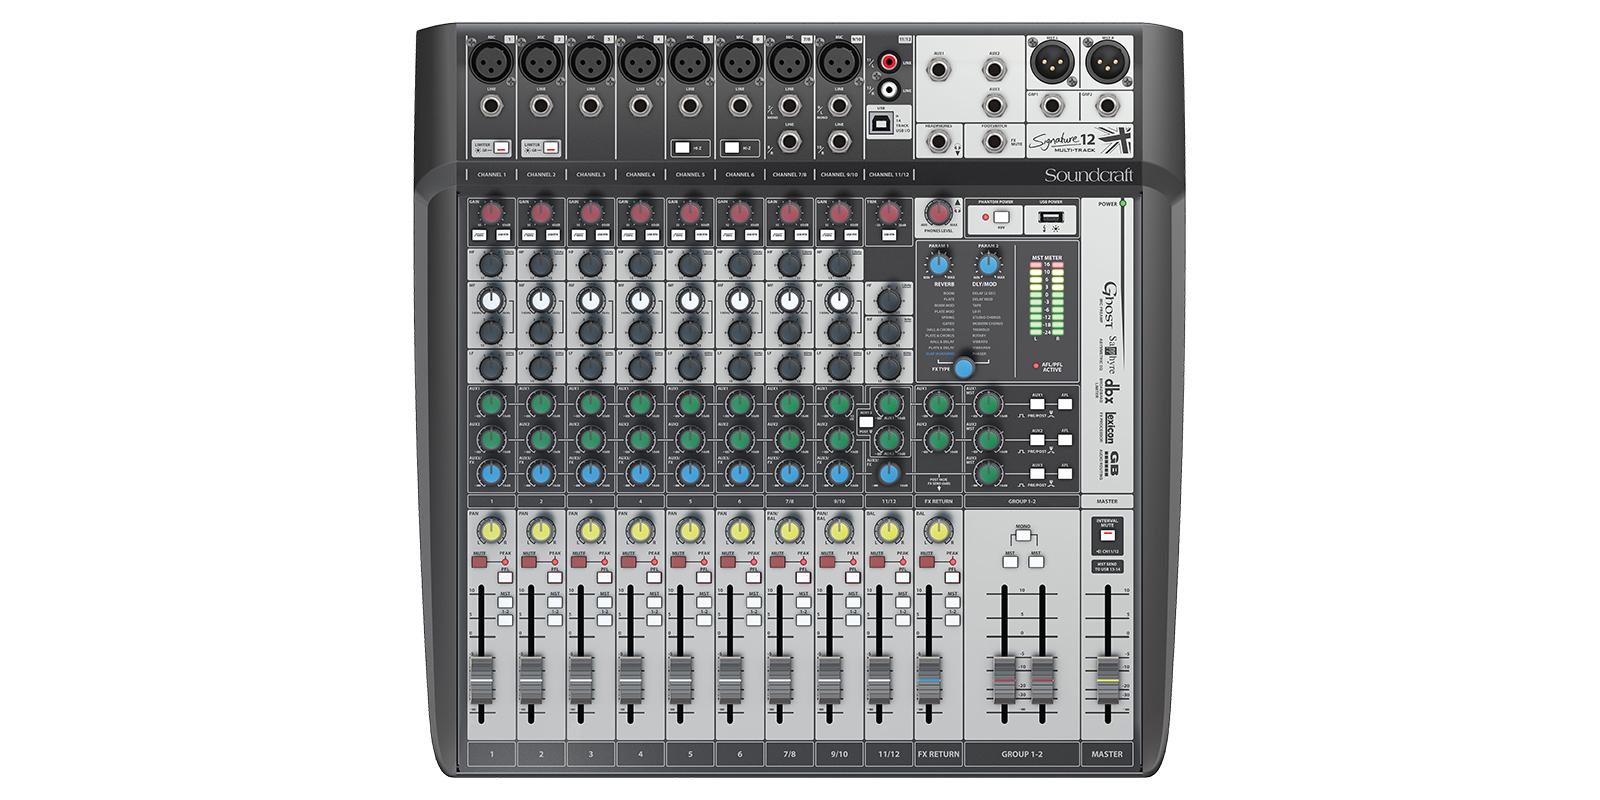 Soundcraft Signature 12 MTK mixer 00861